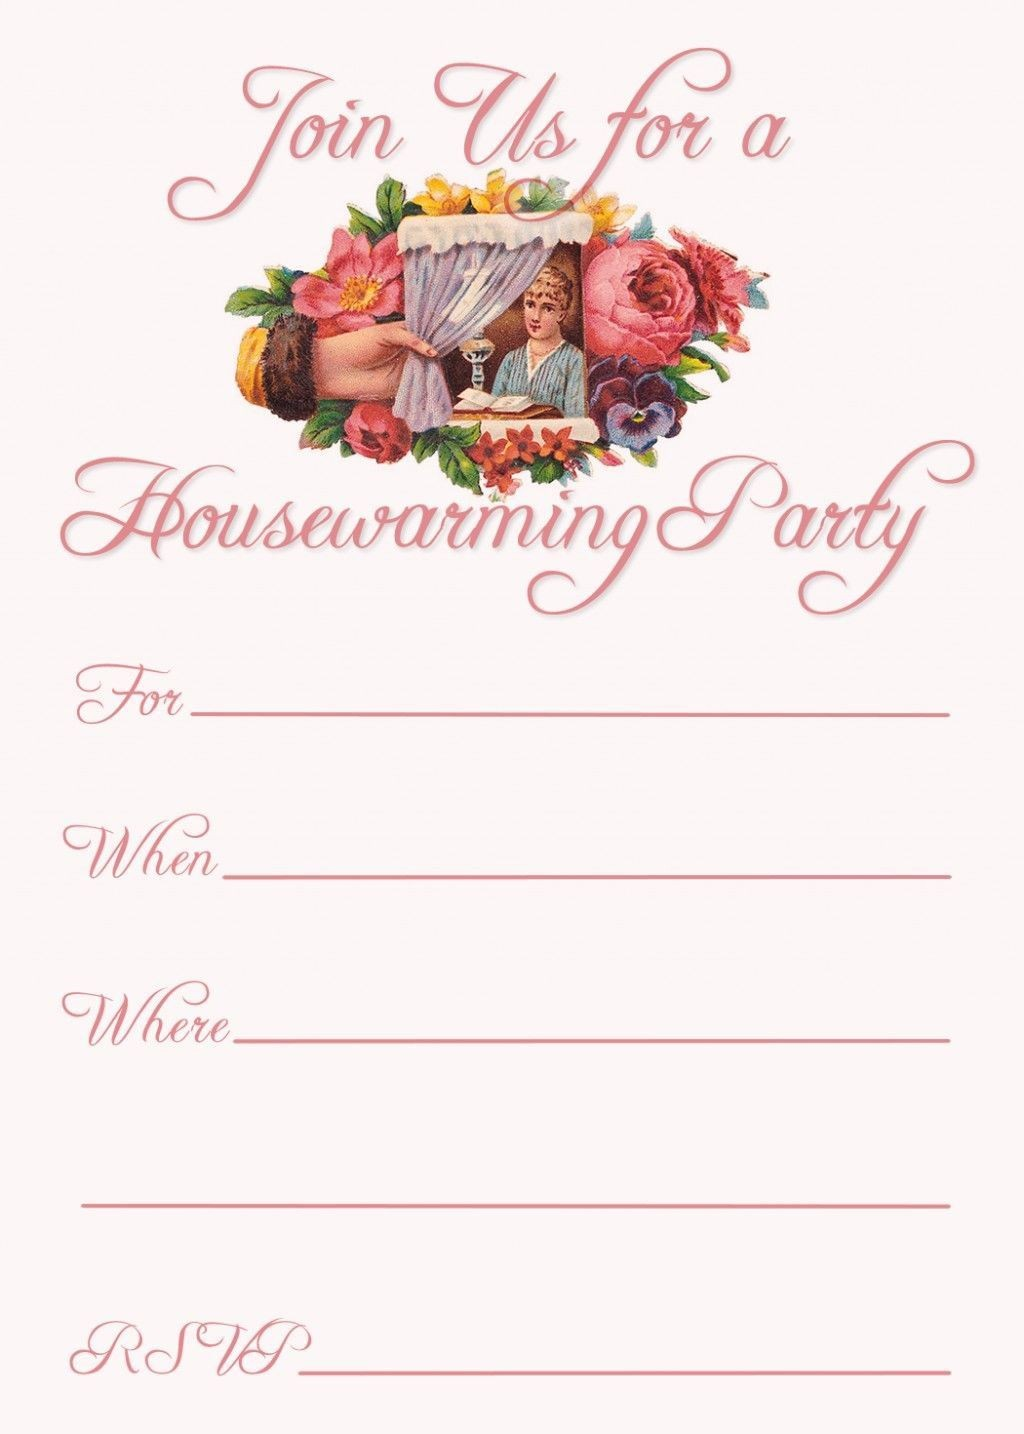 004 Astounding Free Housewarming Invitation Template Photo  Templates Printable India Video DownloadLarge